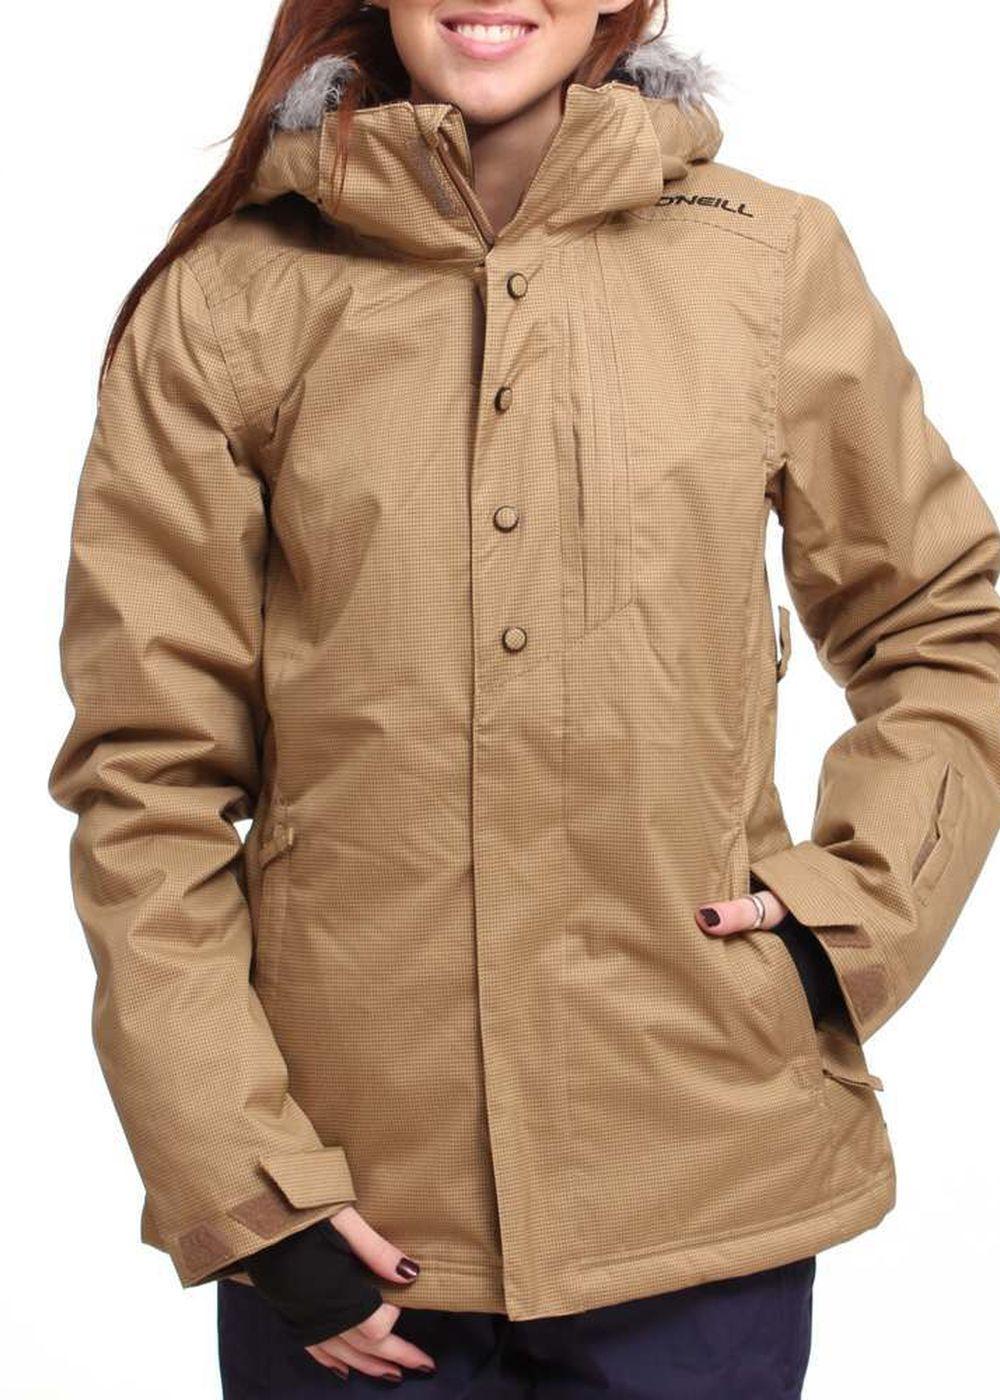 Brown Sports Jacket Snow Jacket Tobacco Brown